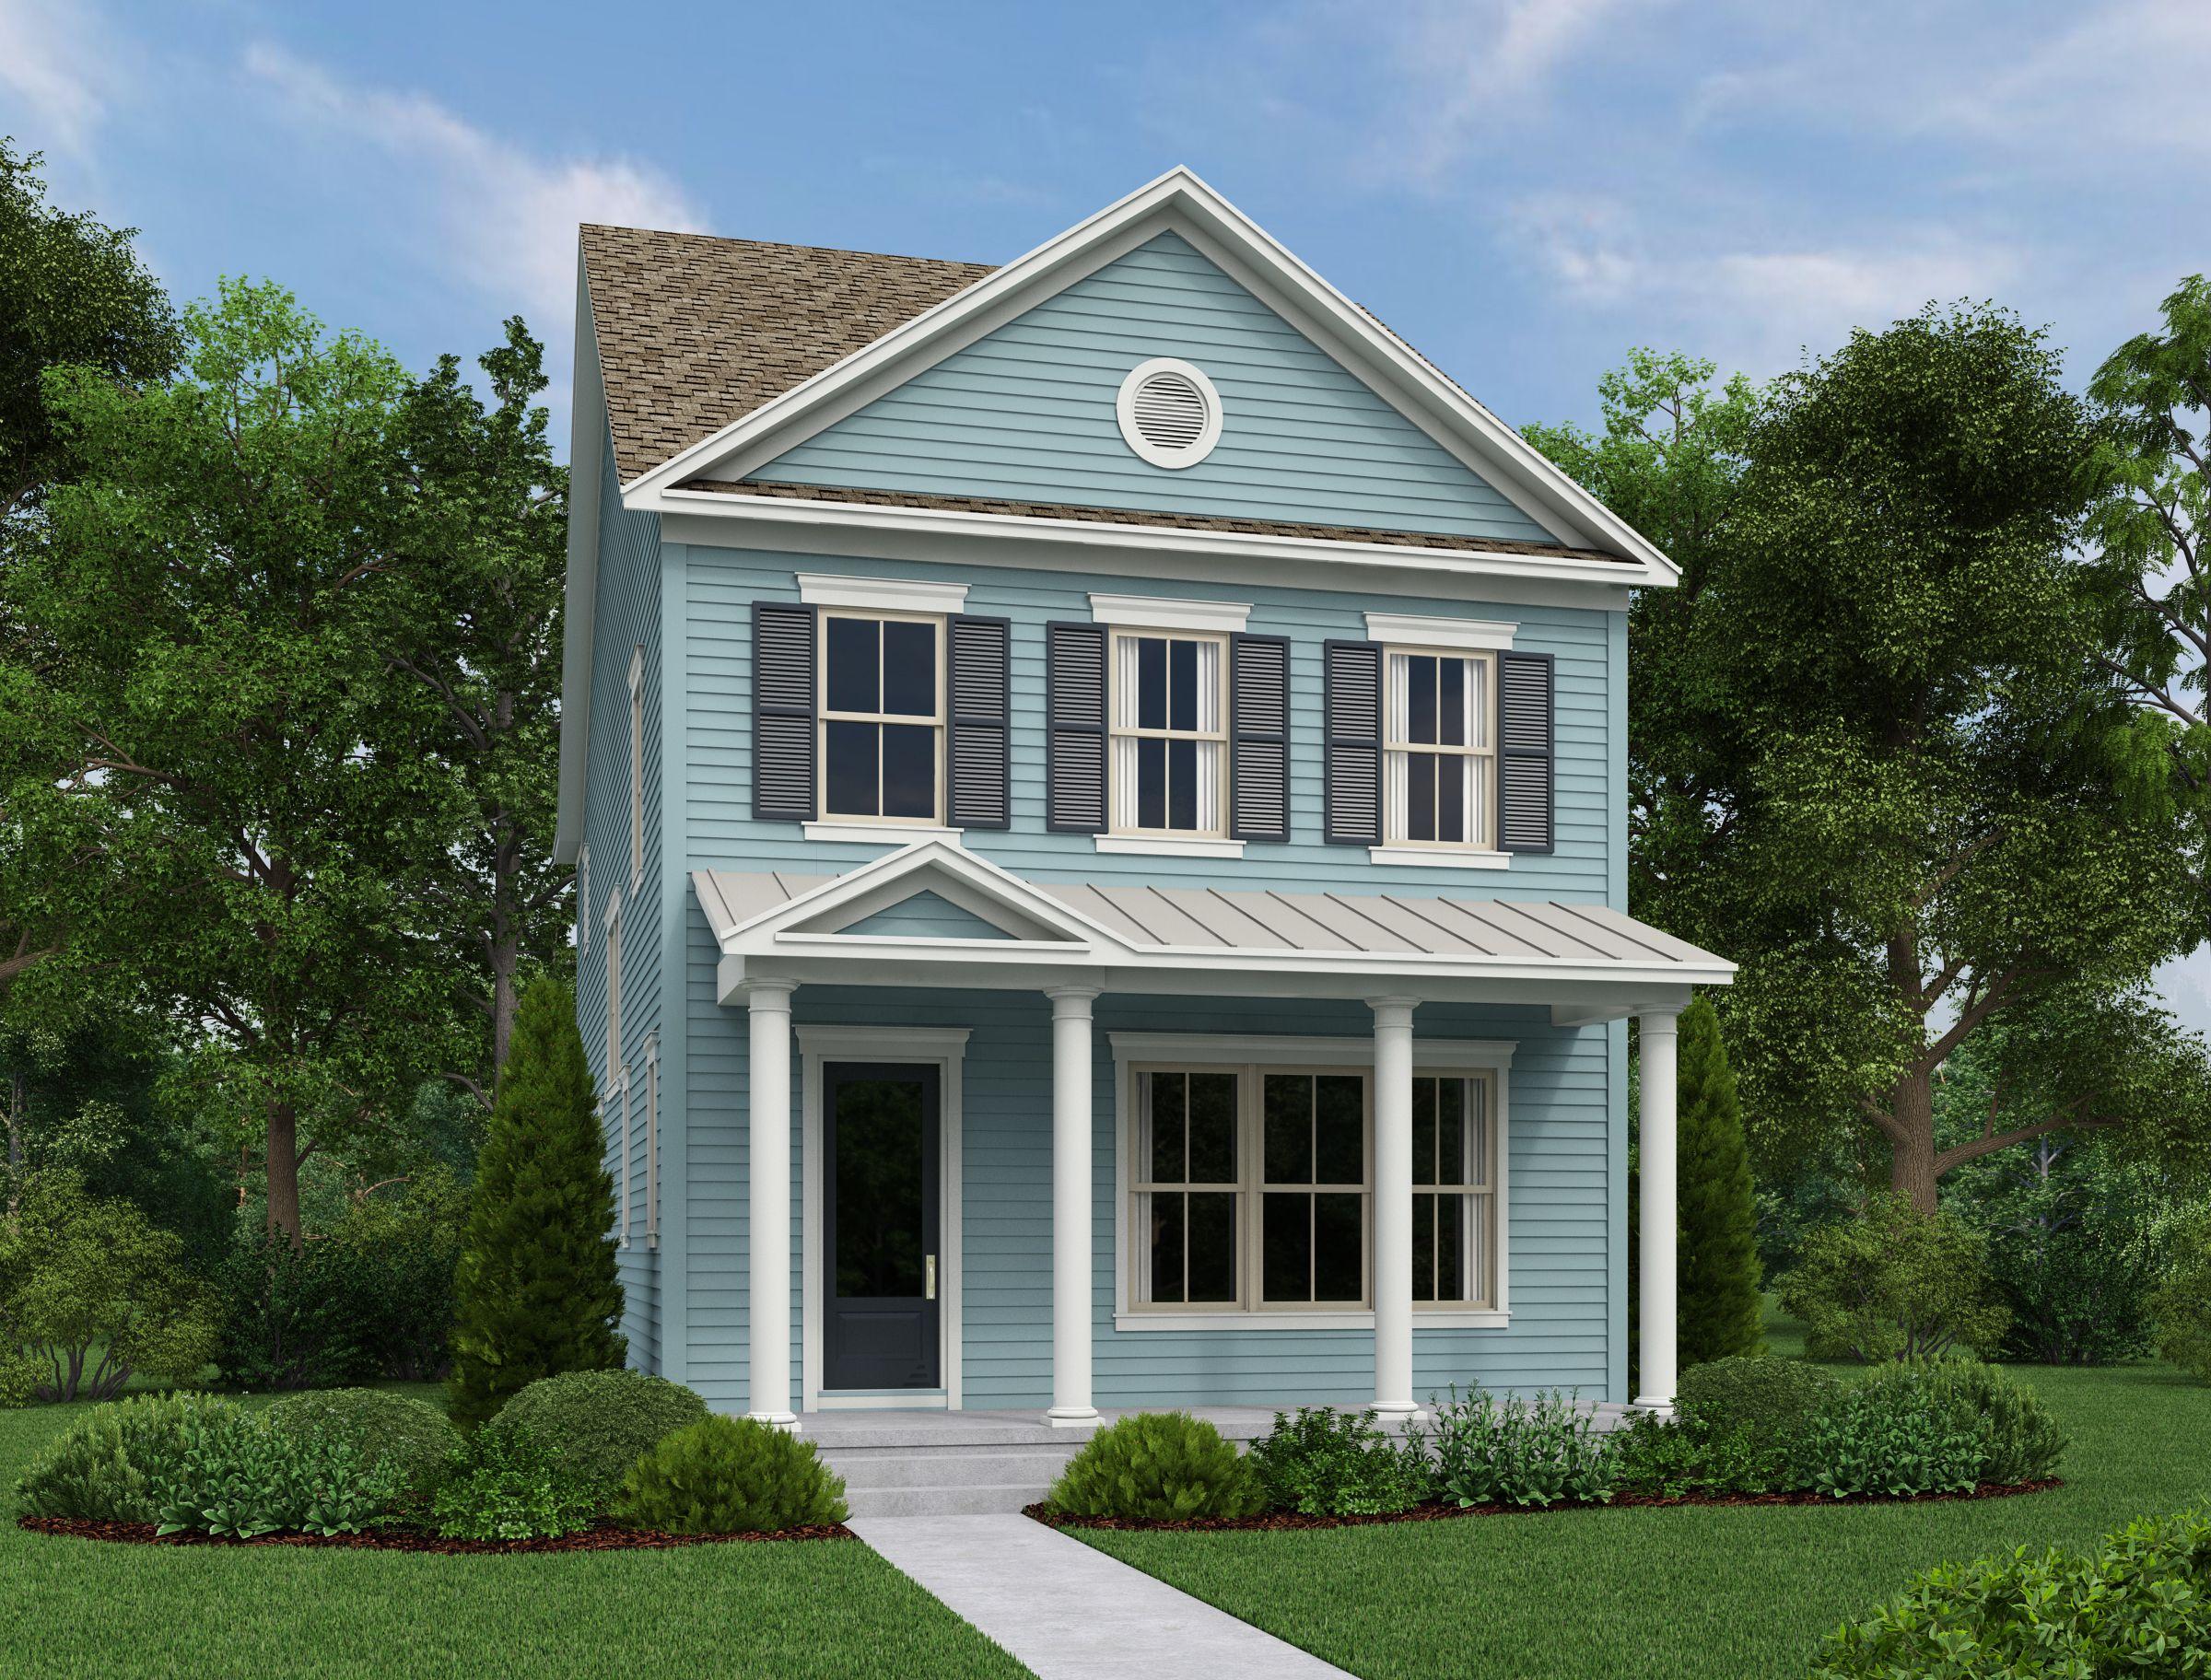 ashton woods homes limehouse village hopkins 1212380 summerville sc new home for sale